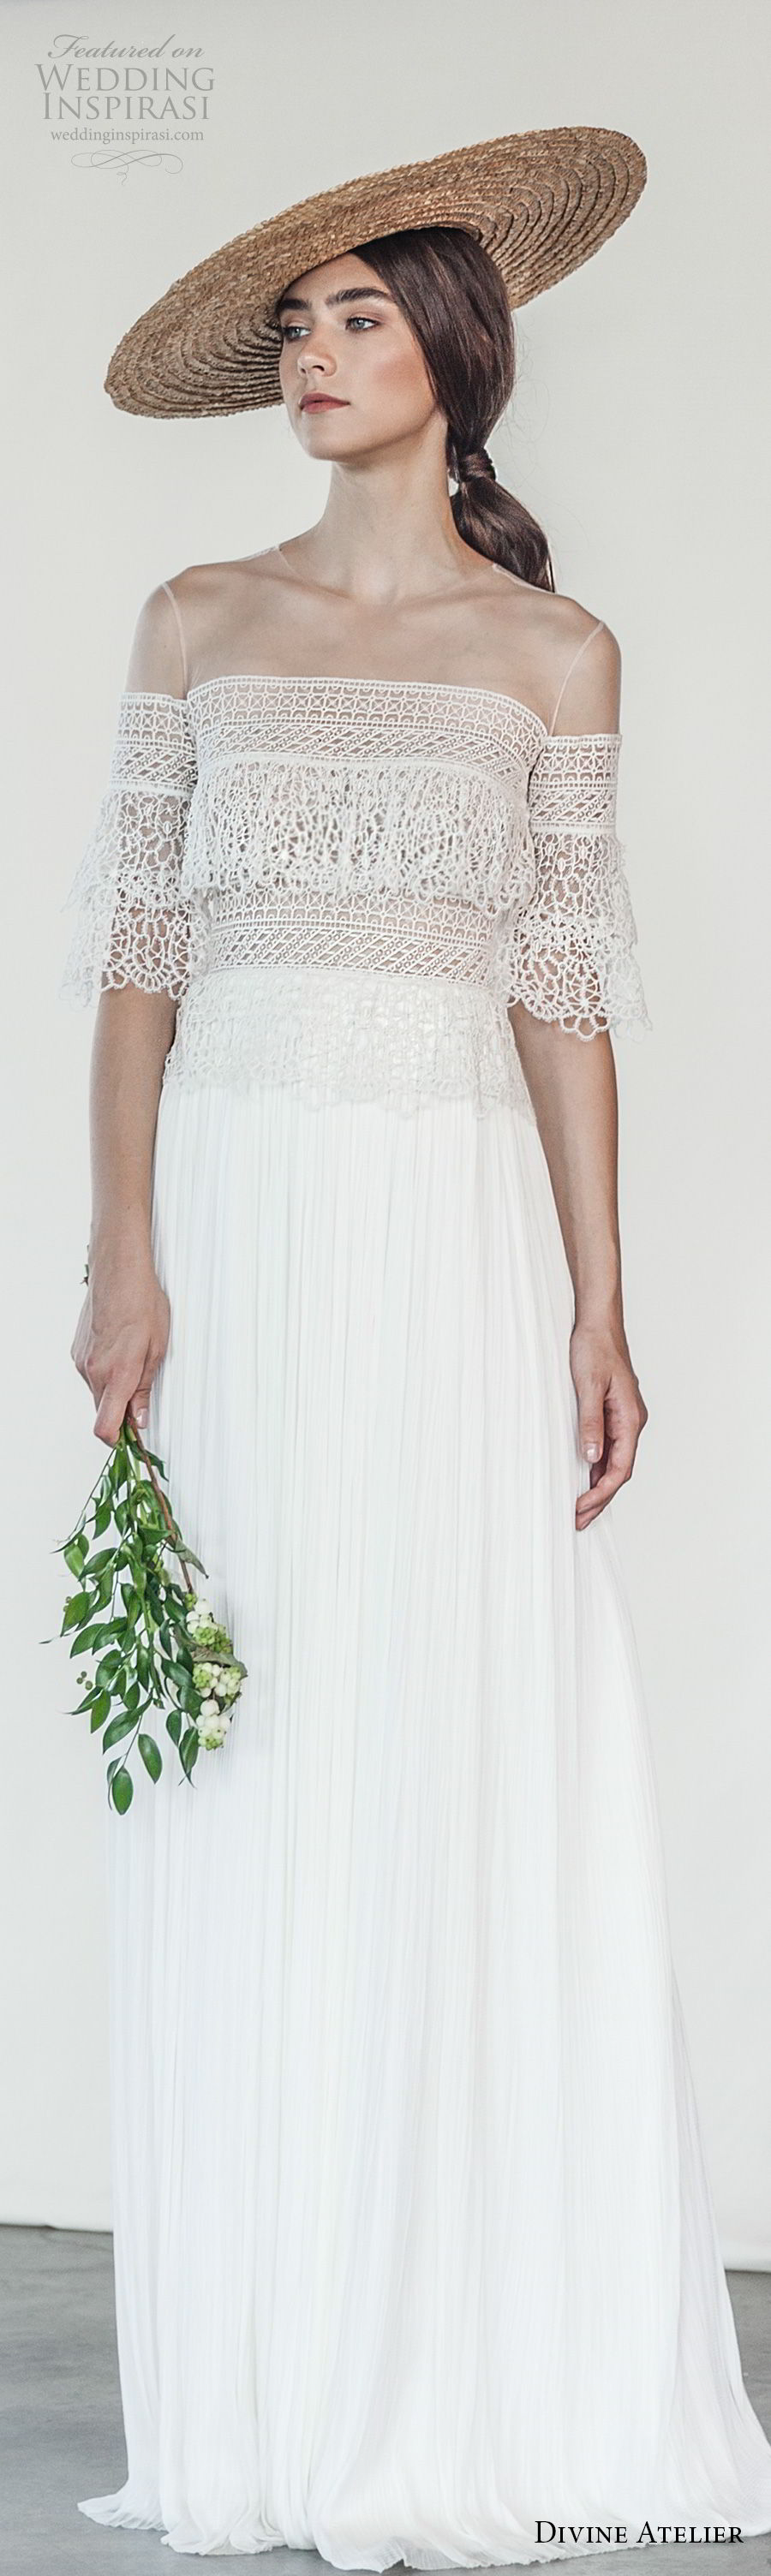 divine atelier 2018 bridal half sleeves illusion jewel neckline straight across neckline heavily embellished bodice romantic bohemian column wedding dress (25) mv